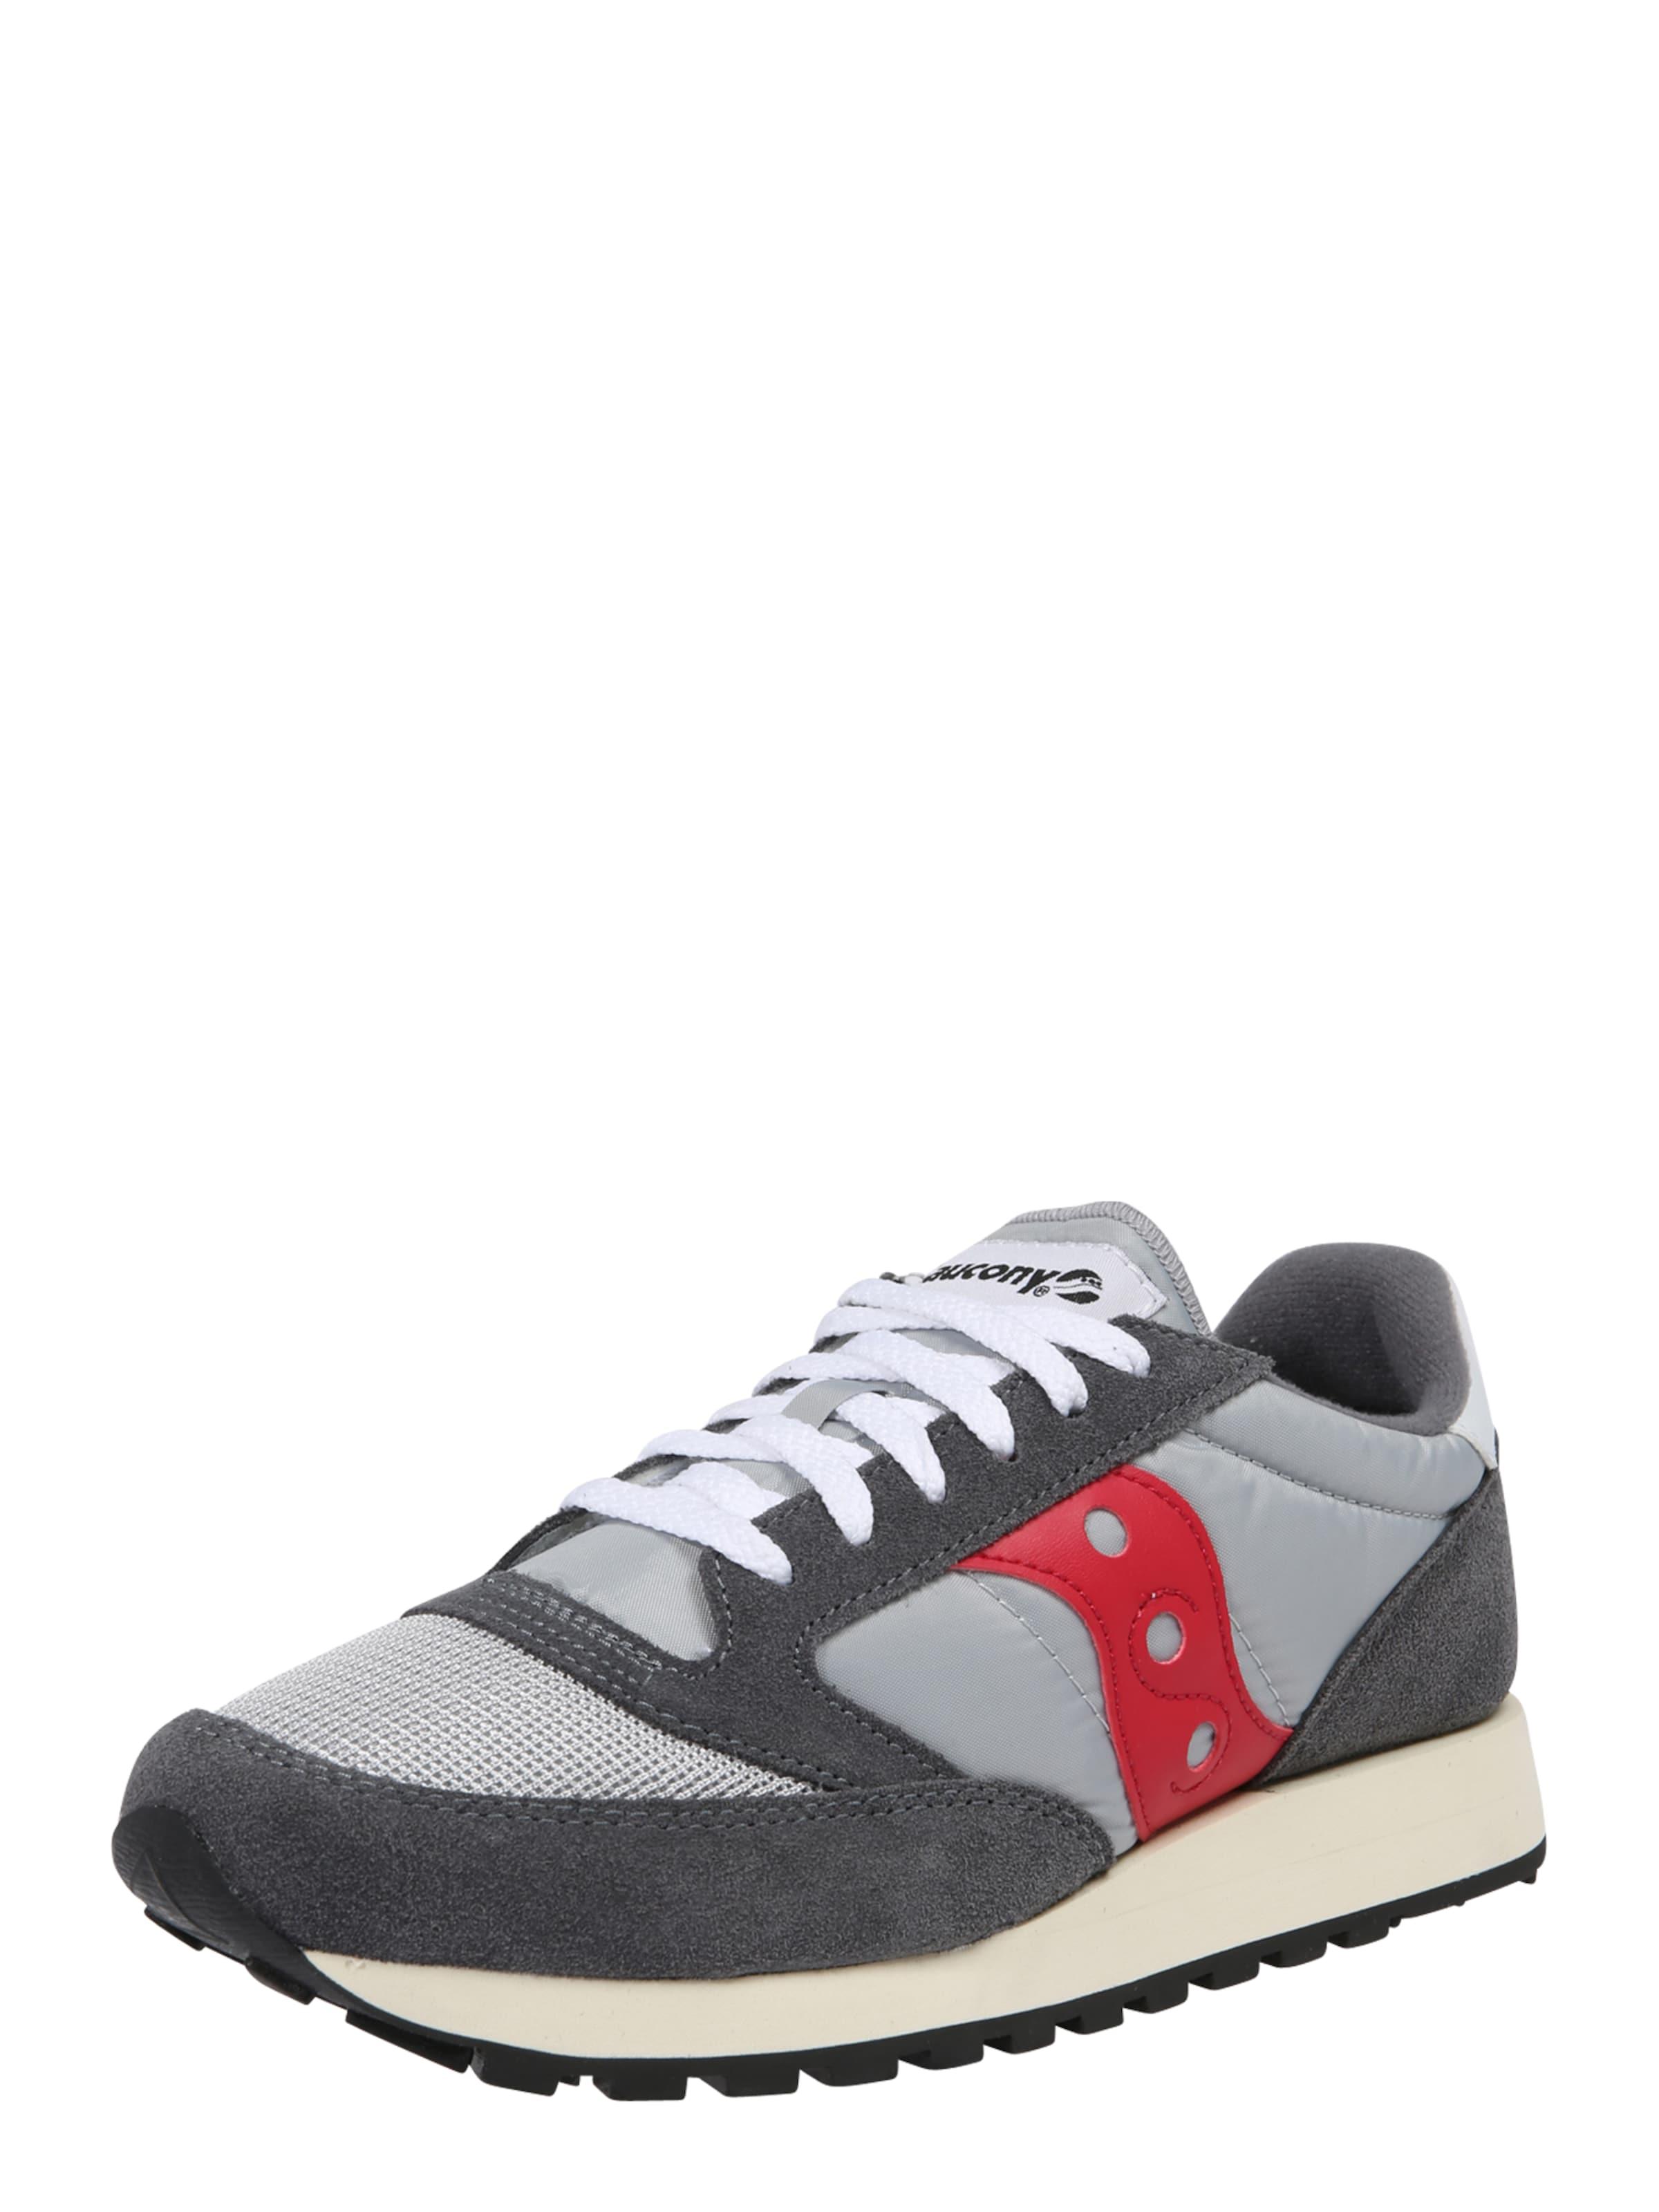 NachtblauOrange Sneakers Original Vintage' Saucony In 'jazz QtrhCsd